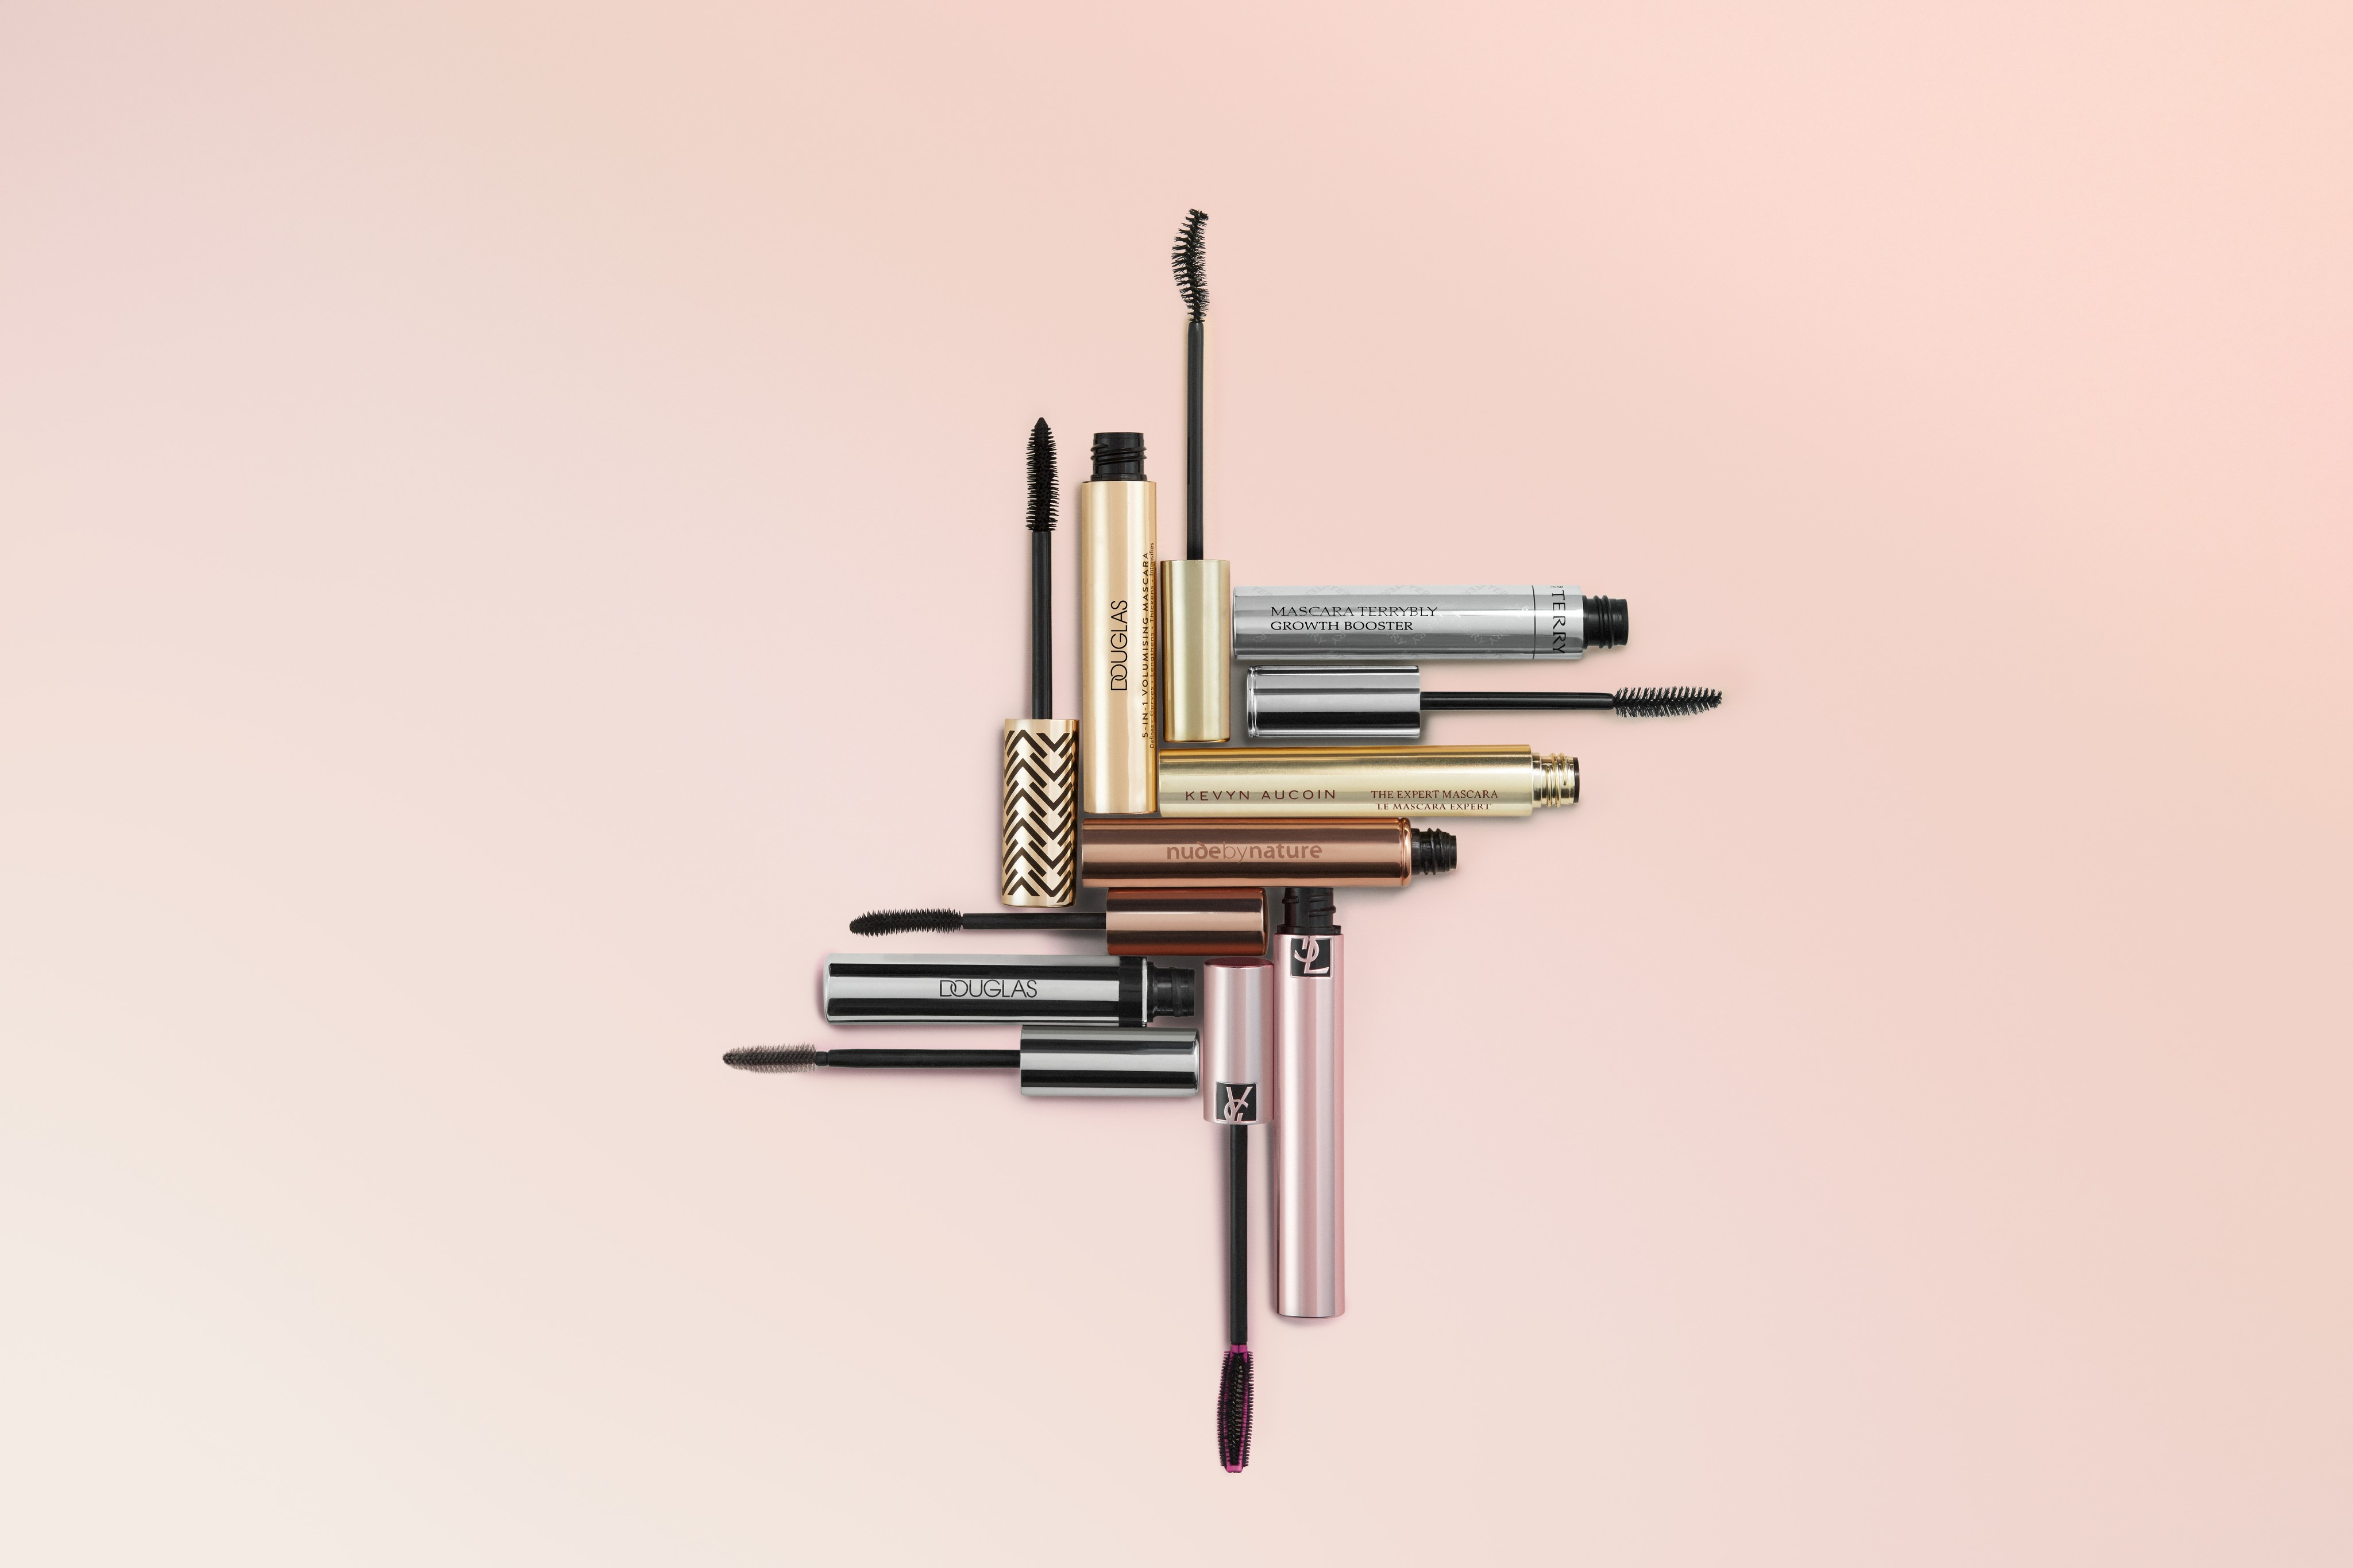 Makeup_mascara_various-brands-3_unlimited-Web-Rendition